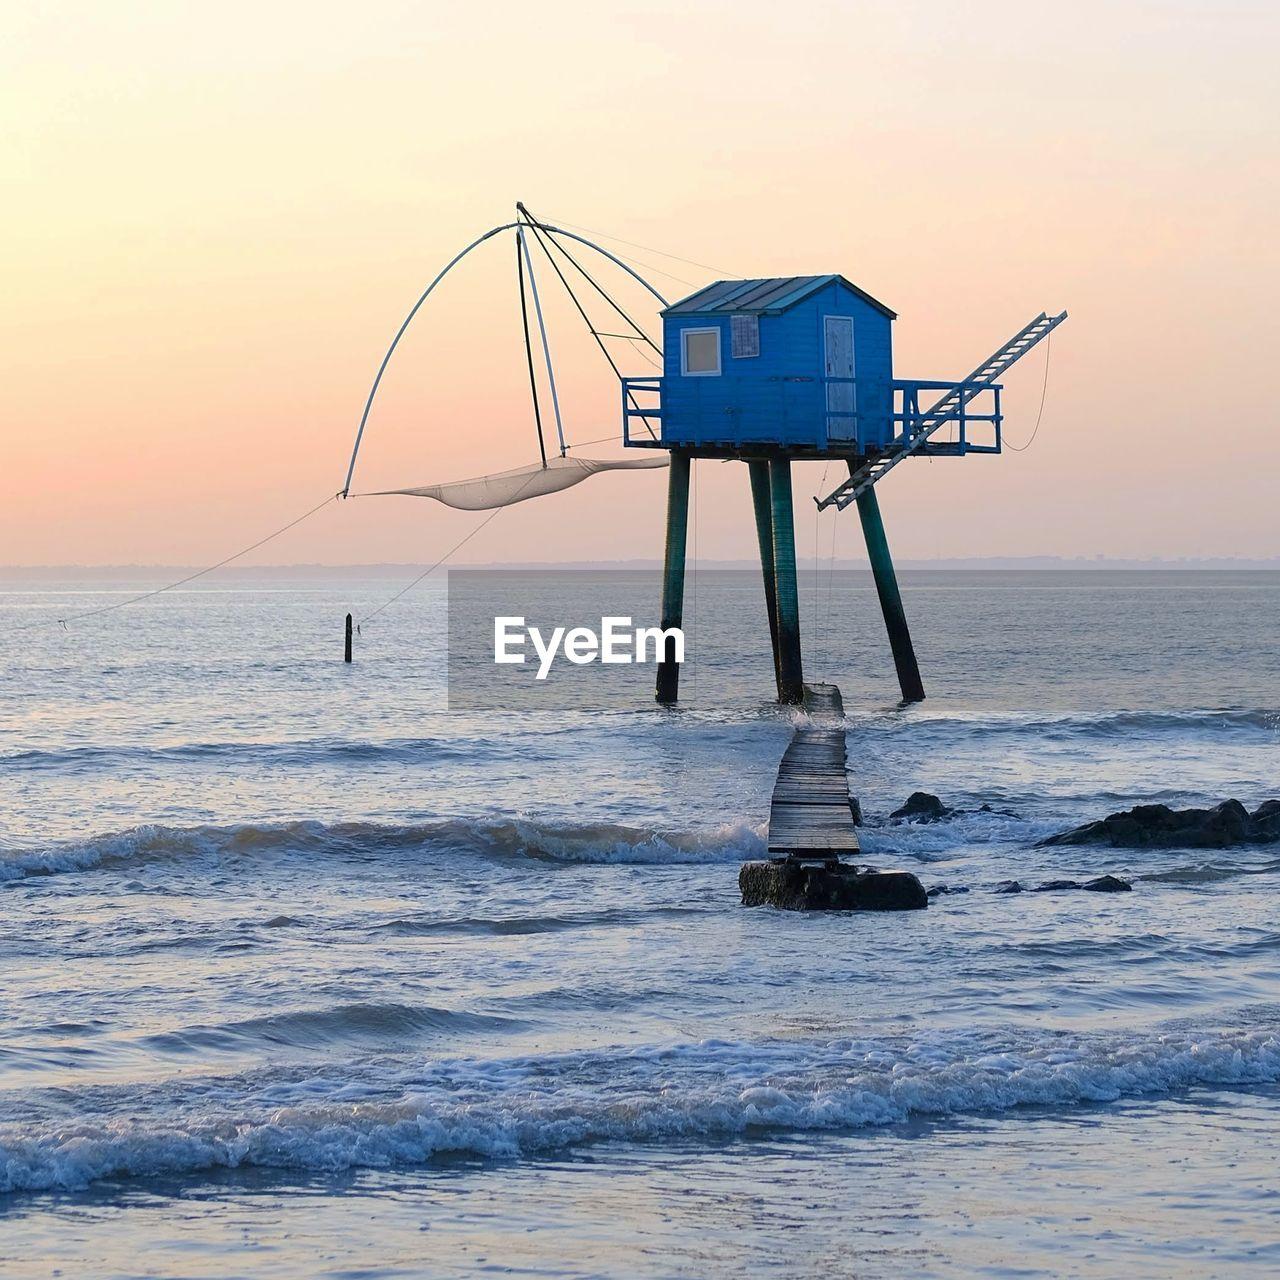 LIFEGUARD HUT ON SEA AGAINST SKY